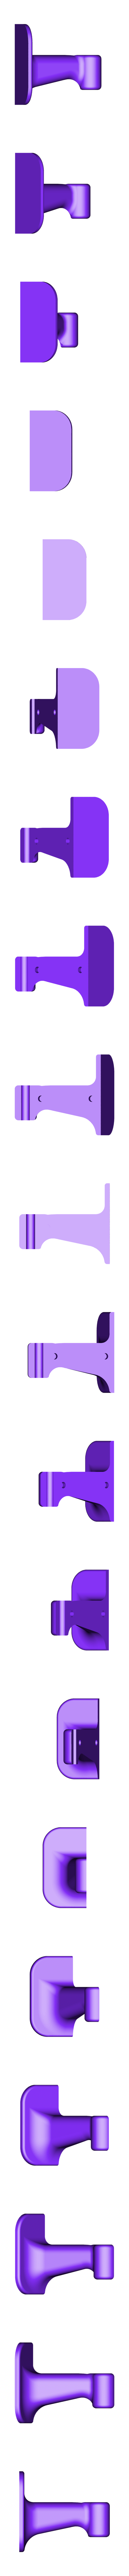 présentoir_-_sym.stl Download free STL file A spinning wheel • 3D printing template, NOP21